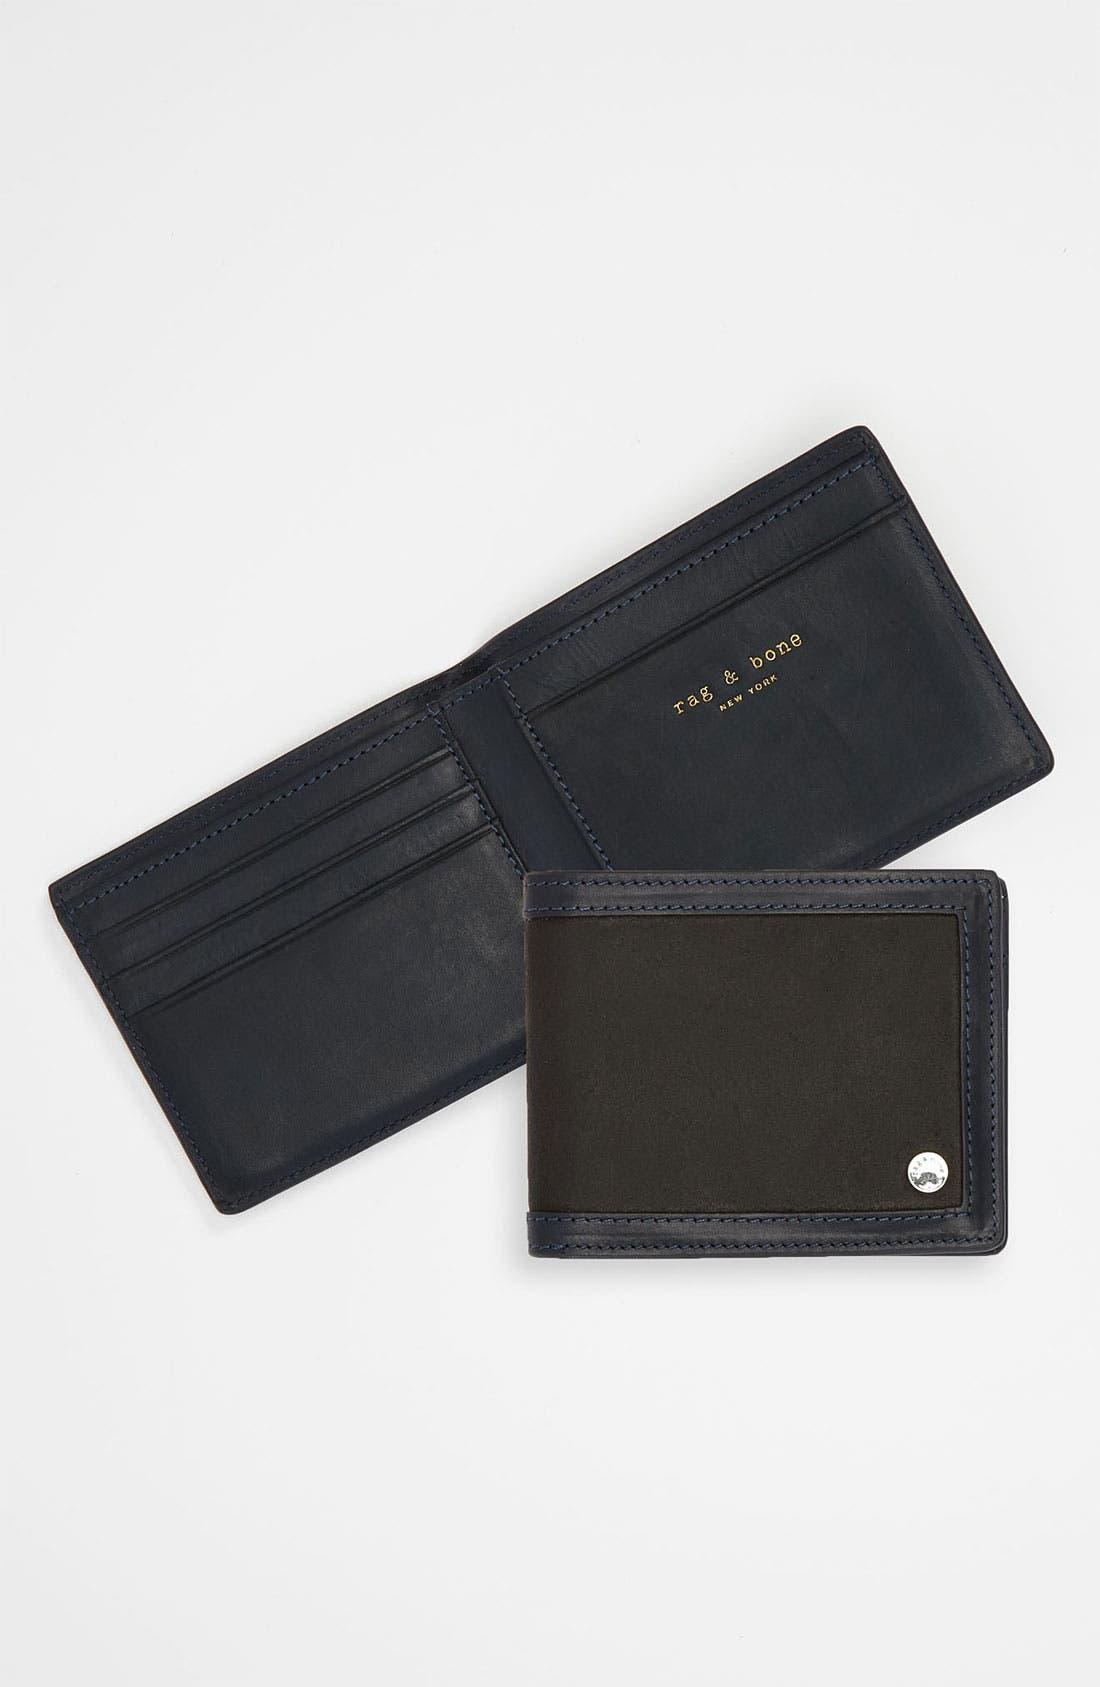 Alternate Image 1 Selected - rag & bone Leather Wallet